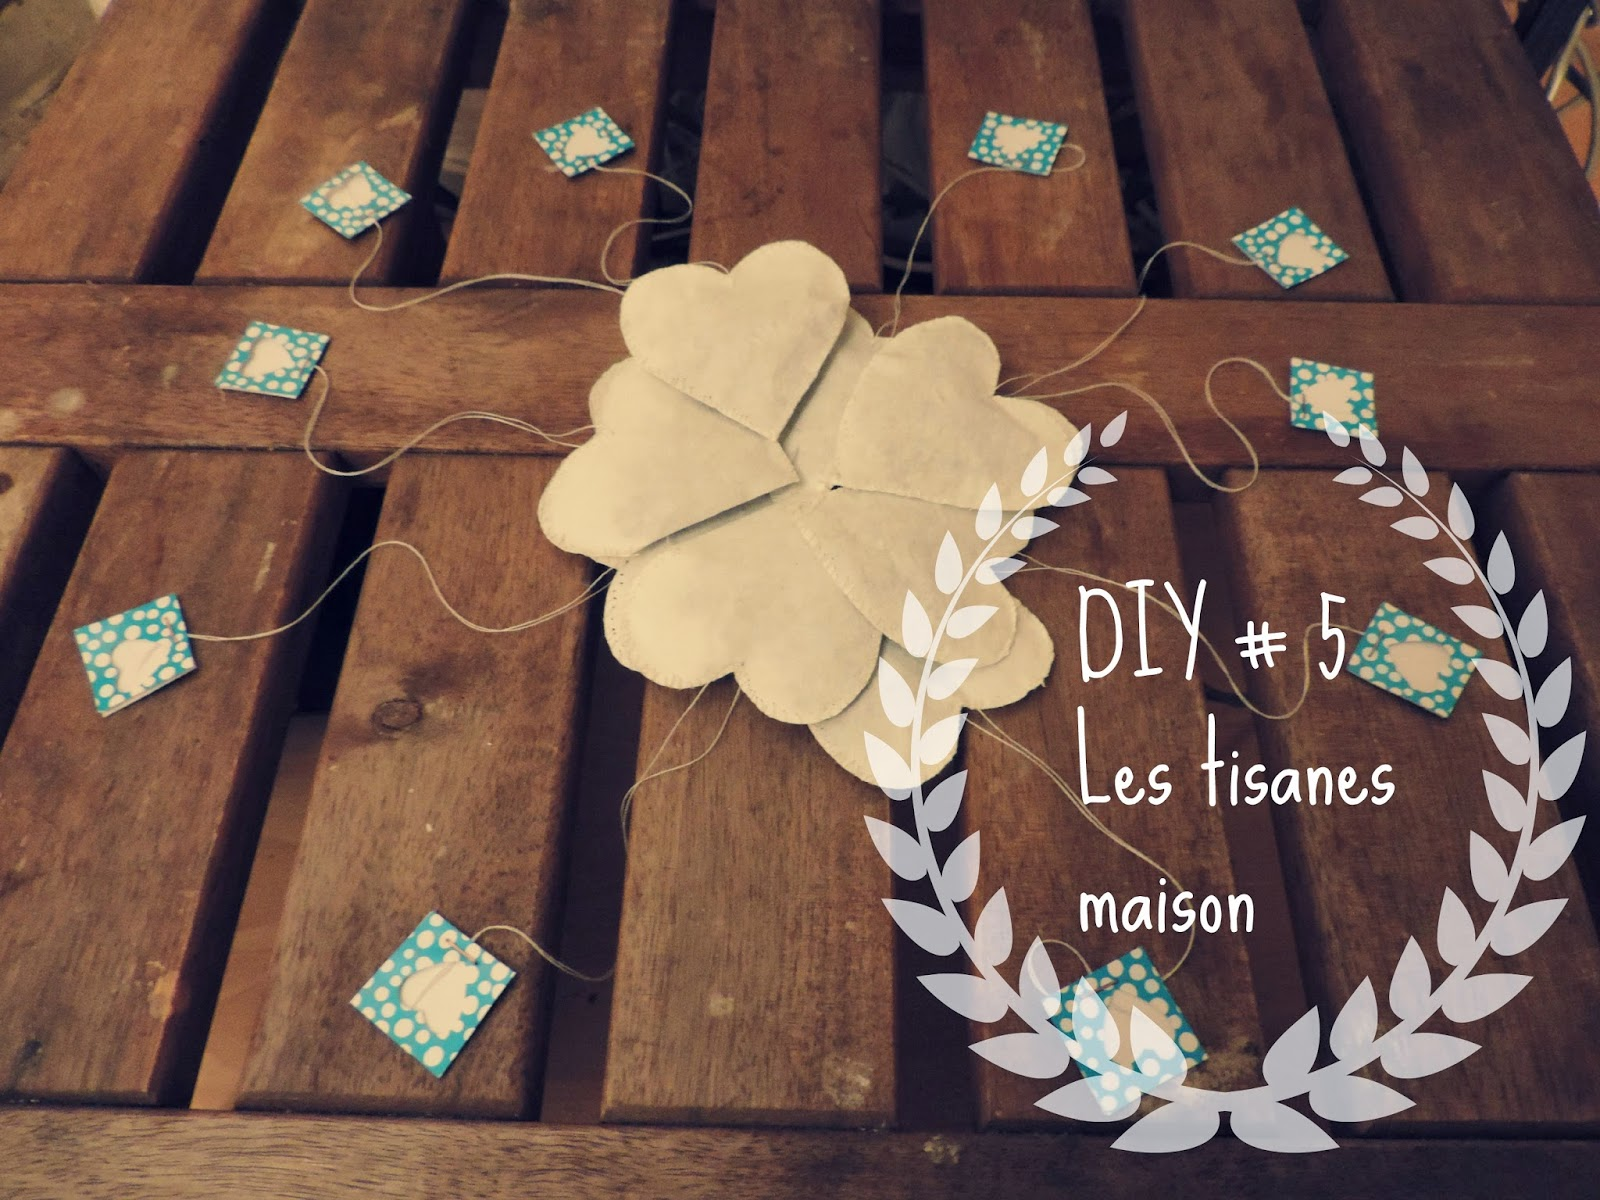 http://mynameisgeorges.blogspot.com/2014/03/diy-5-les-tisanes-maison.html